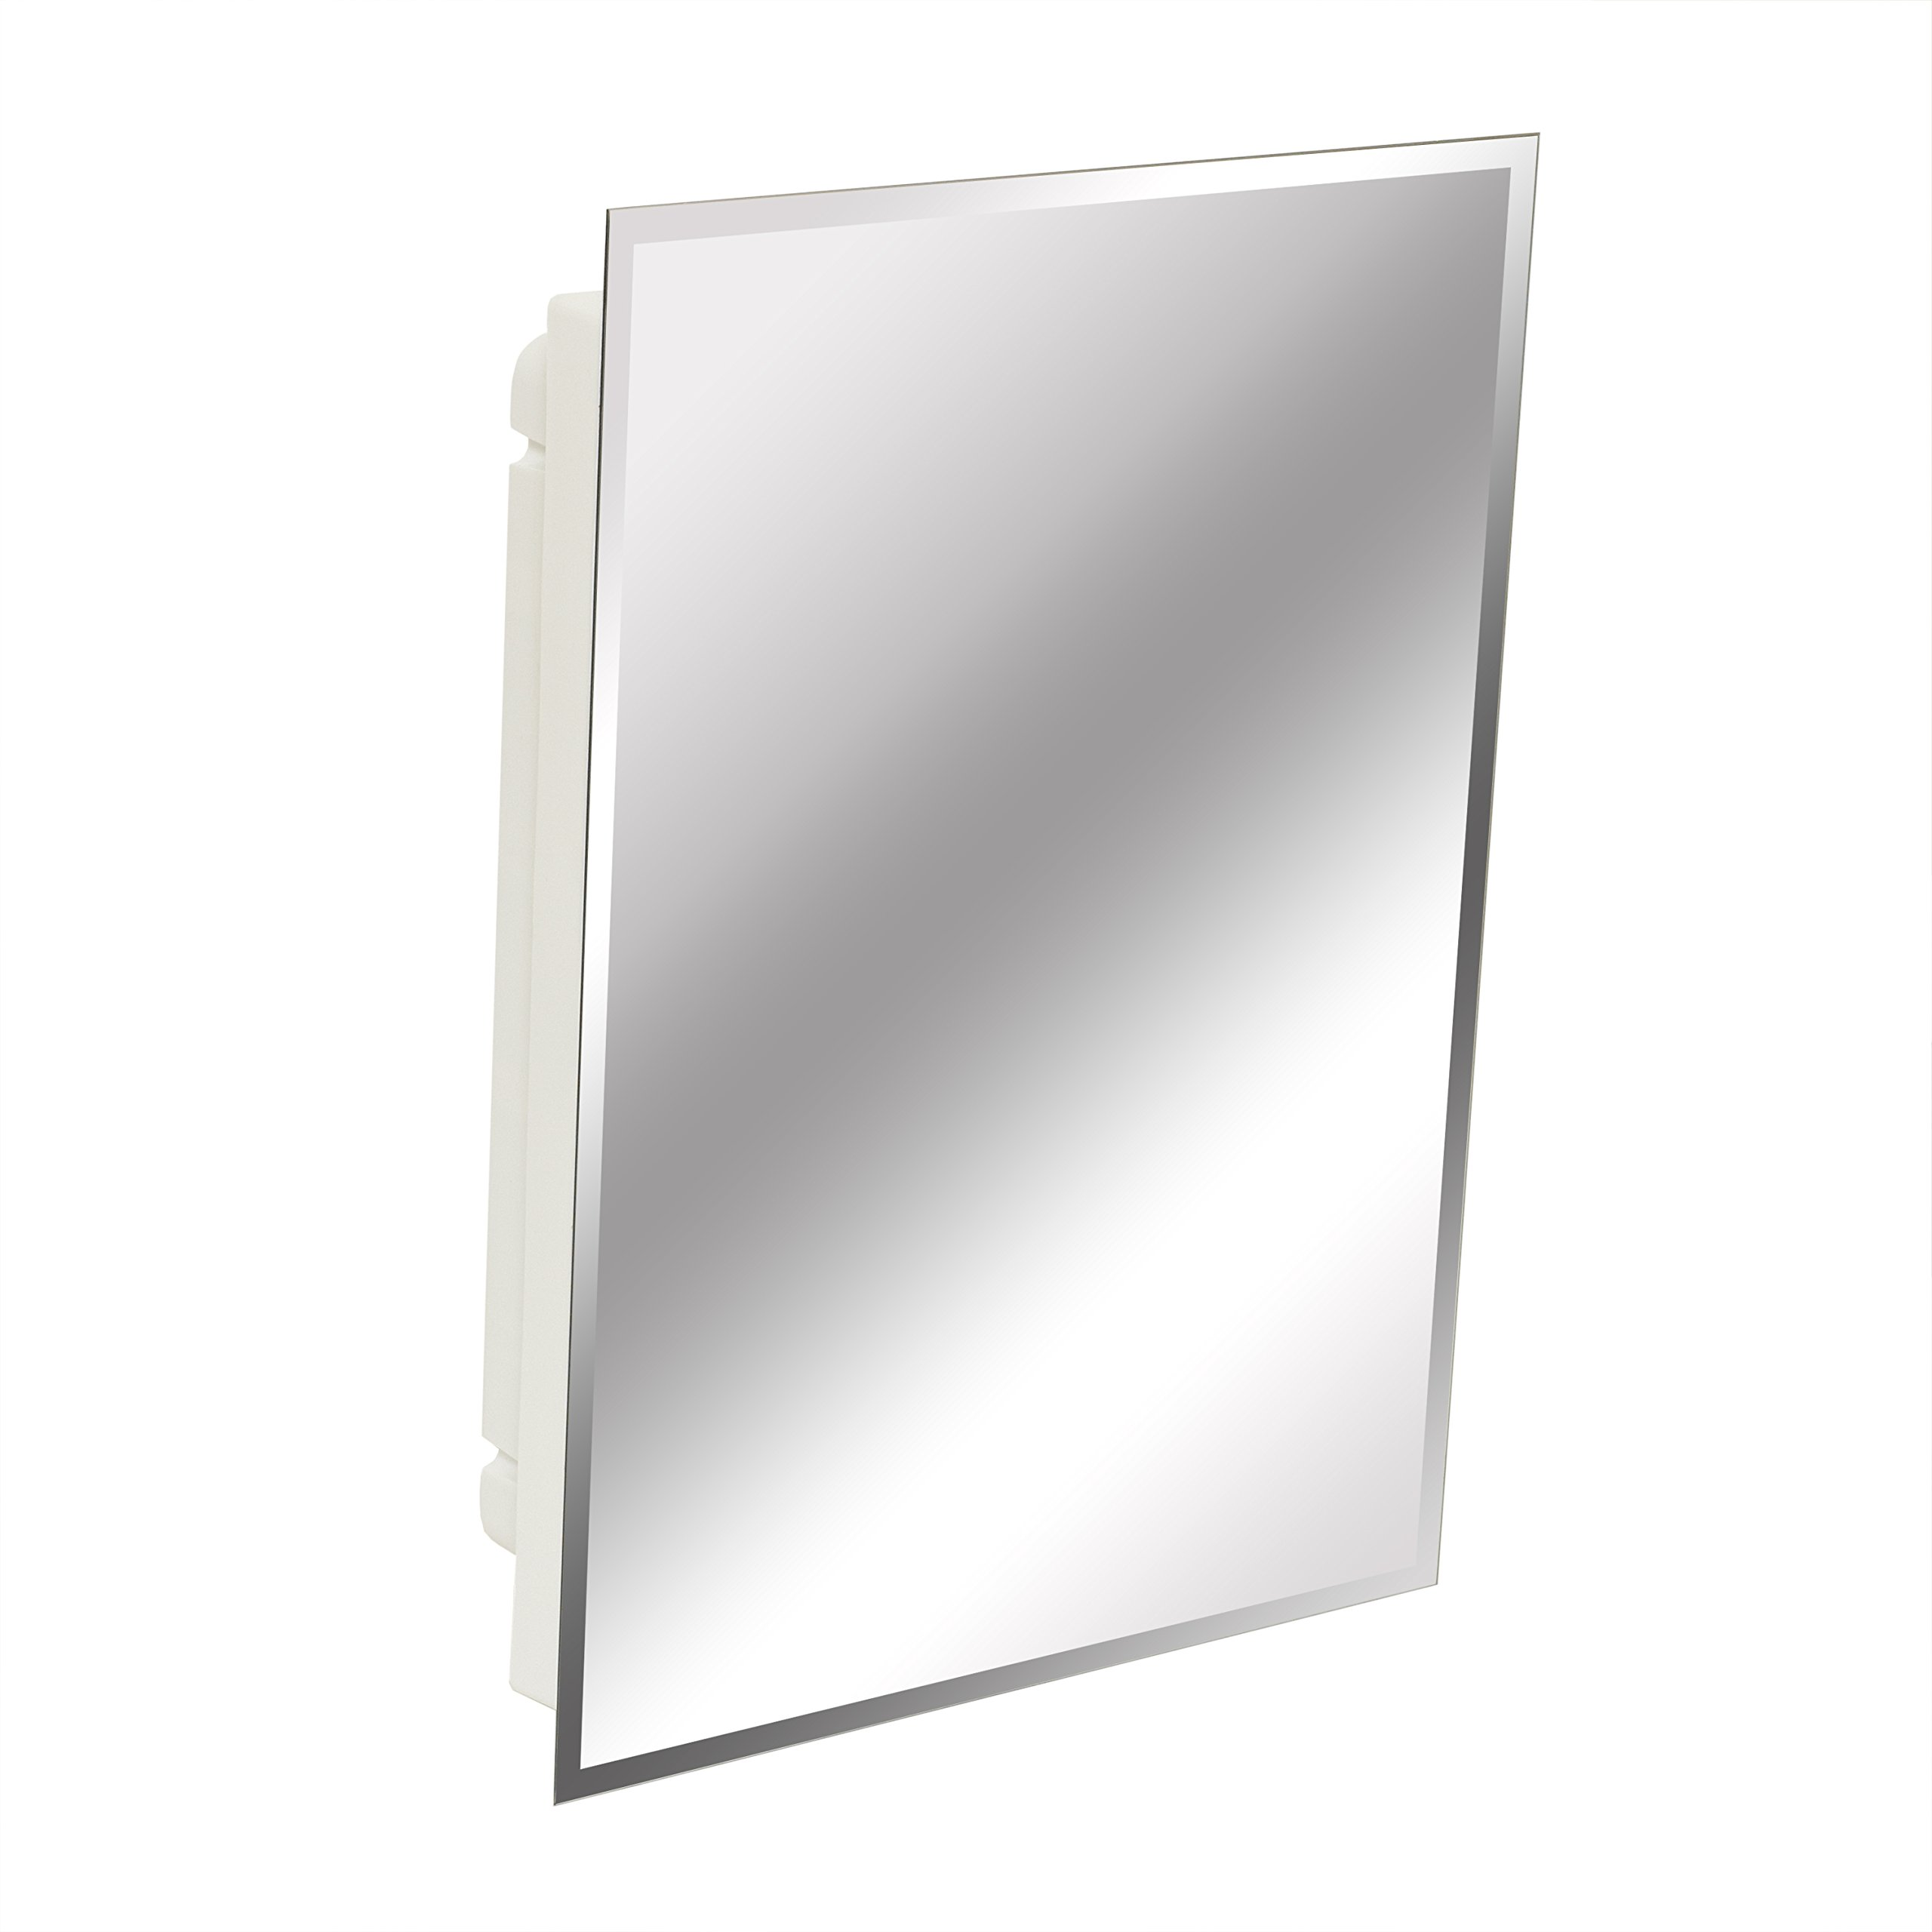 American Pride 9622WBAR12 - Recessed Frameless Beveled Polished Edge Mirror Medicine Cabinet 16'' x 22'' by American Pride